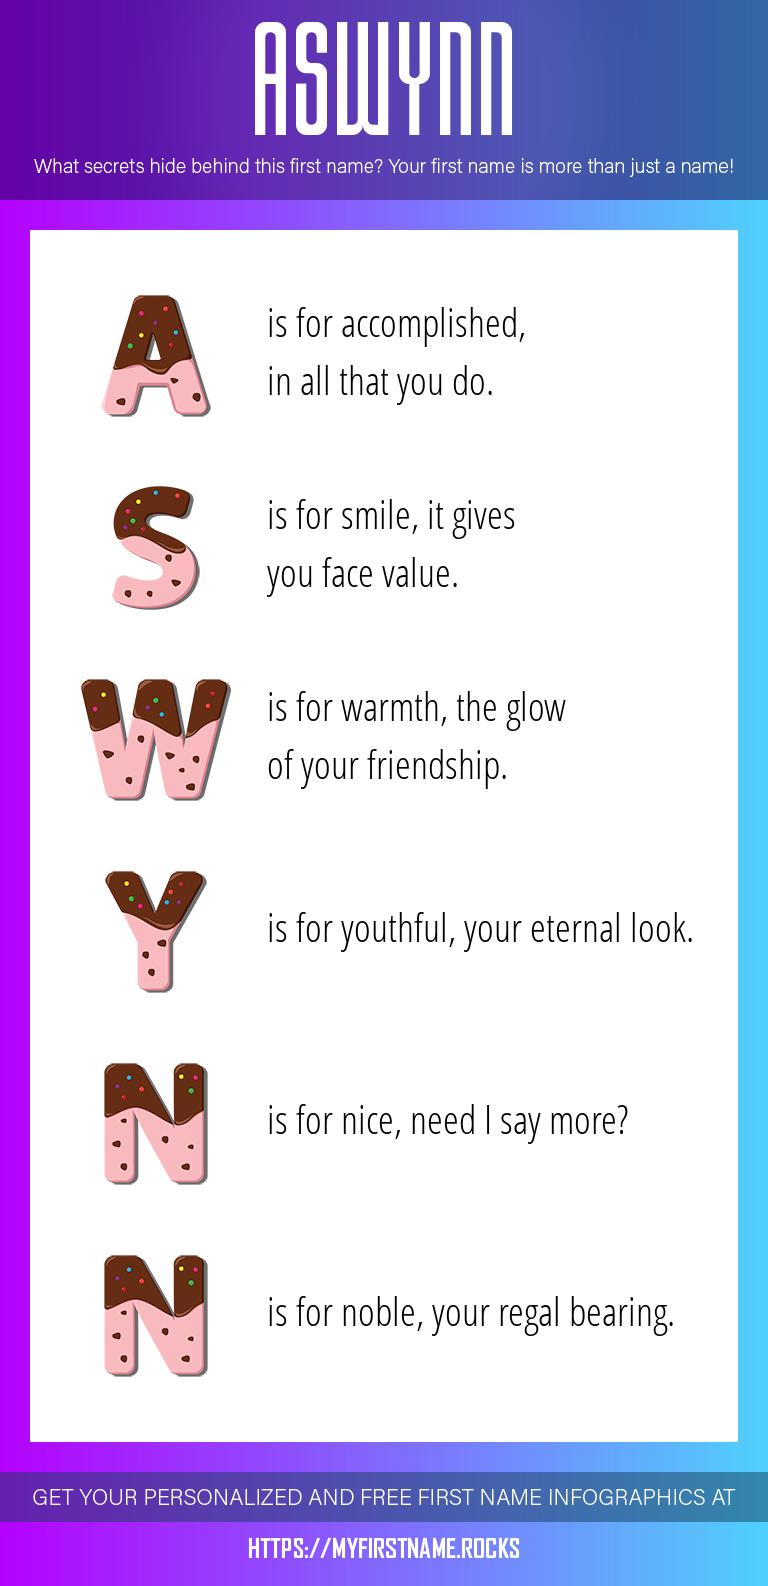 Aswynn Infographics